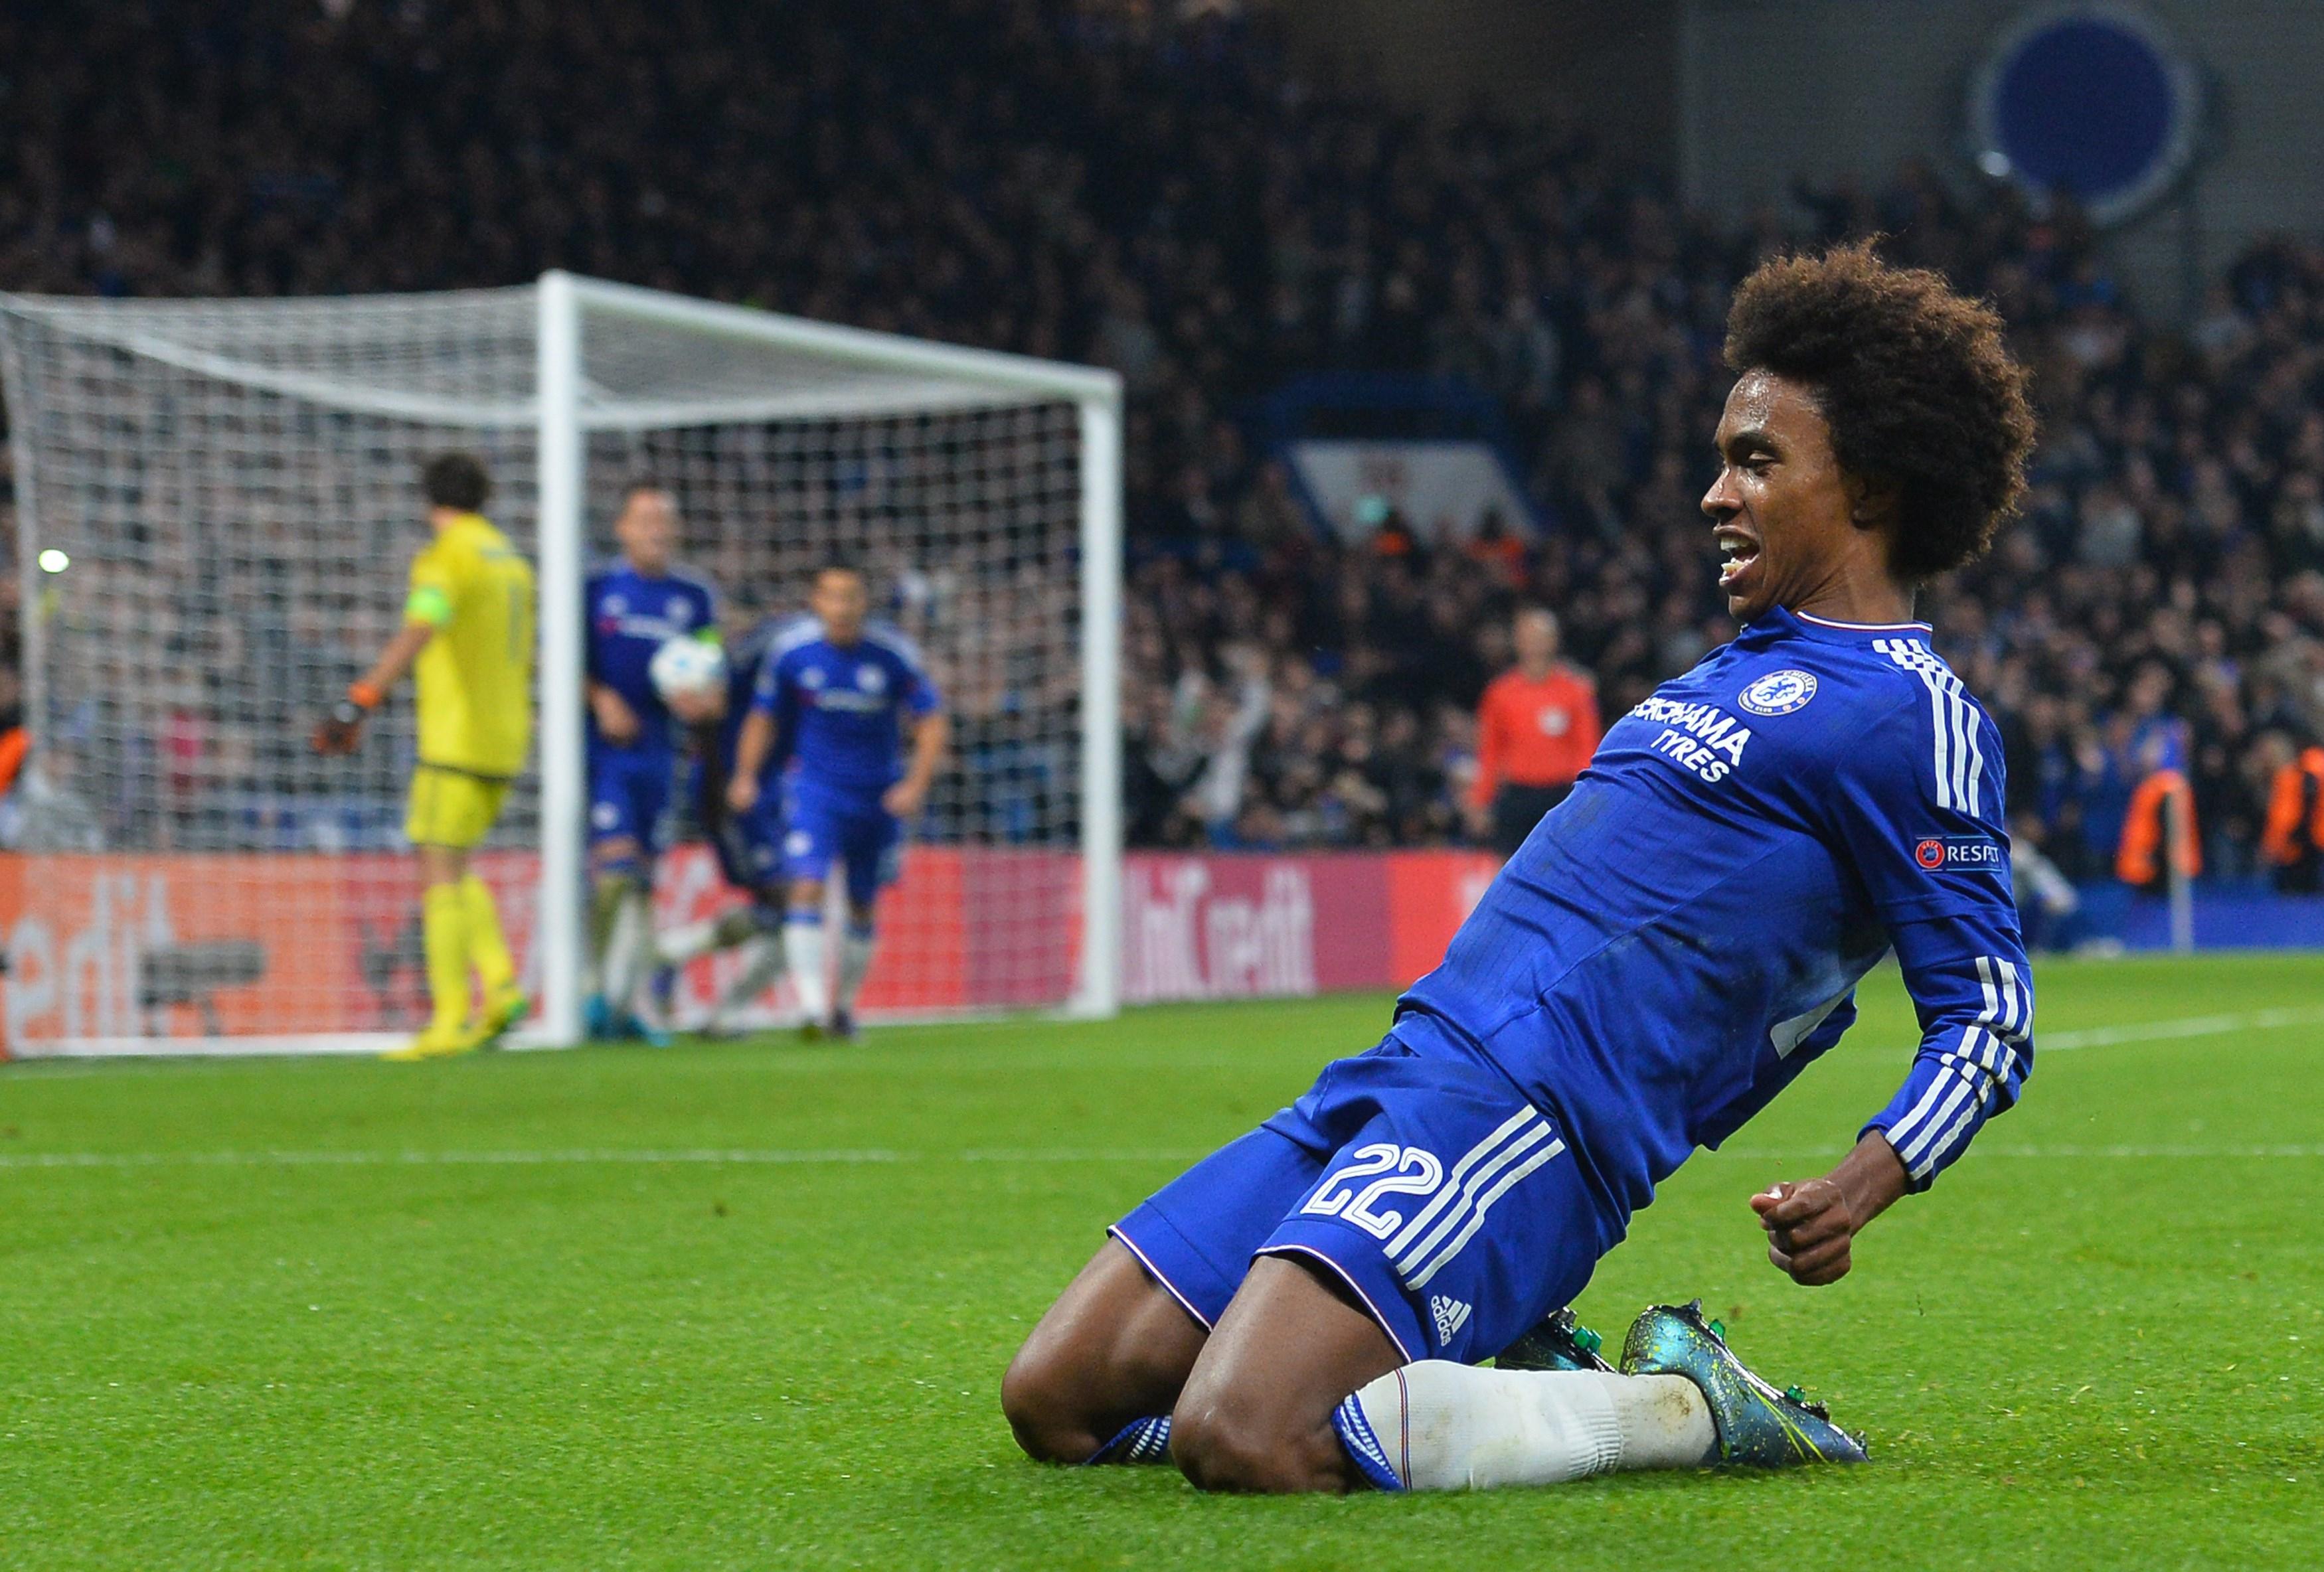 Dynamo Kyjev – Chelsea Facebook: Chelsea 2 Dynamo Kiev 1: Verdict & Dream Team Ratings